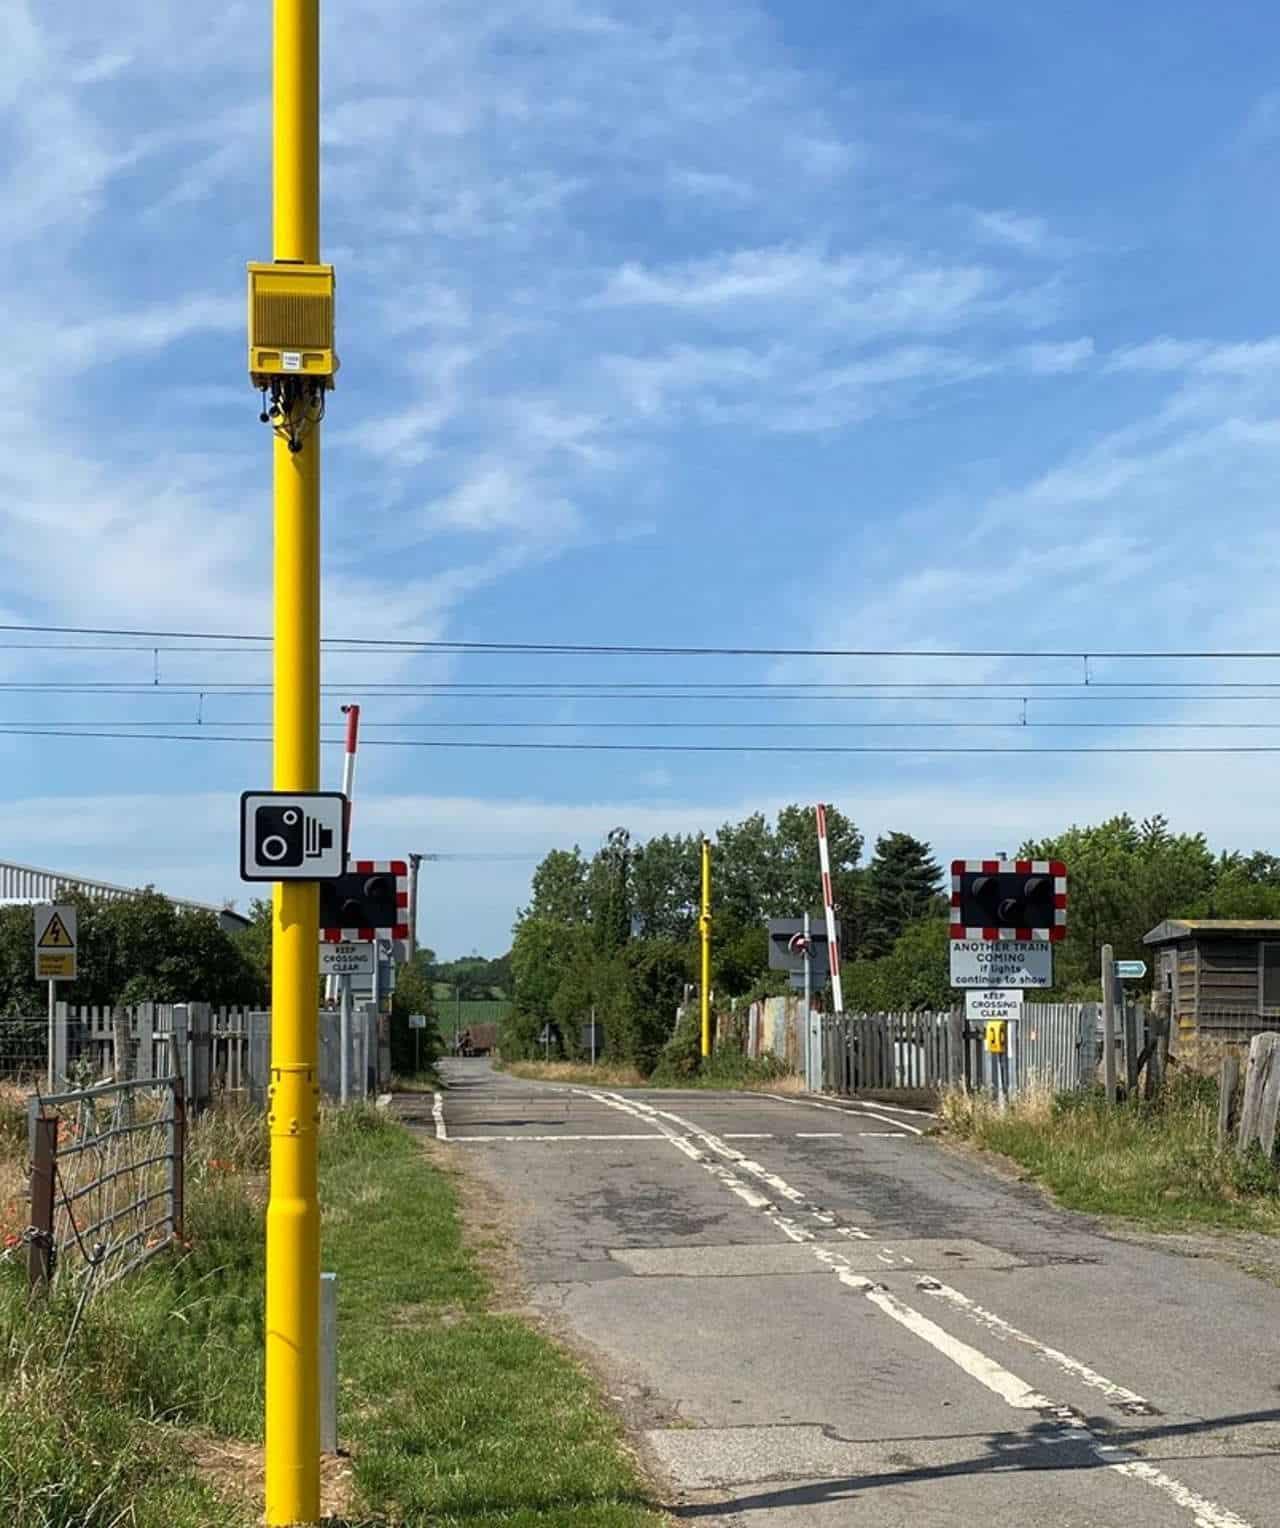 Baylham level crossing